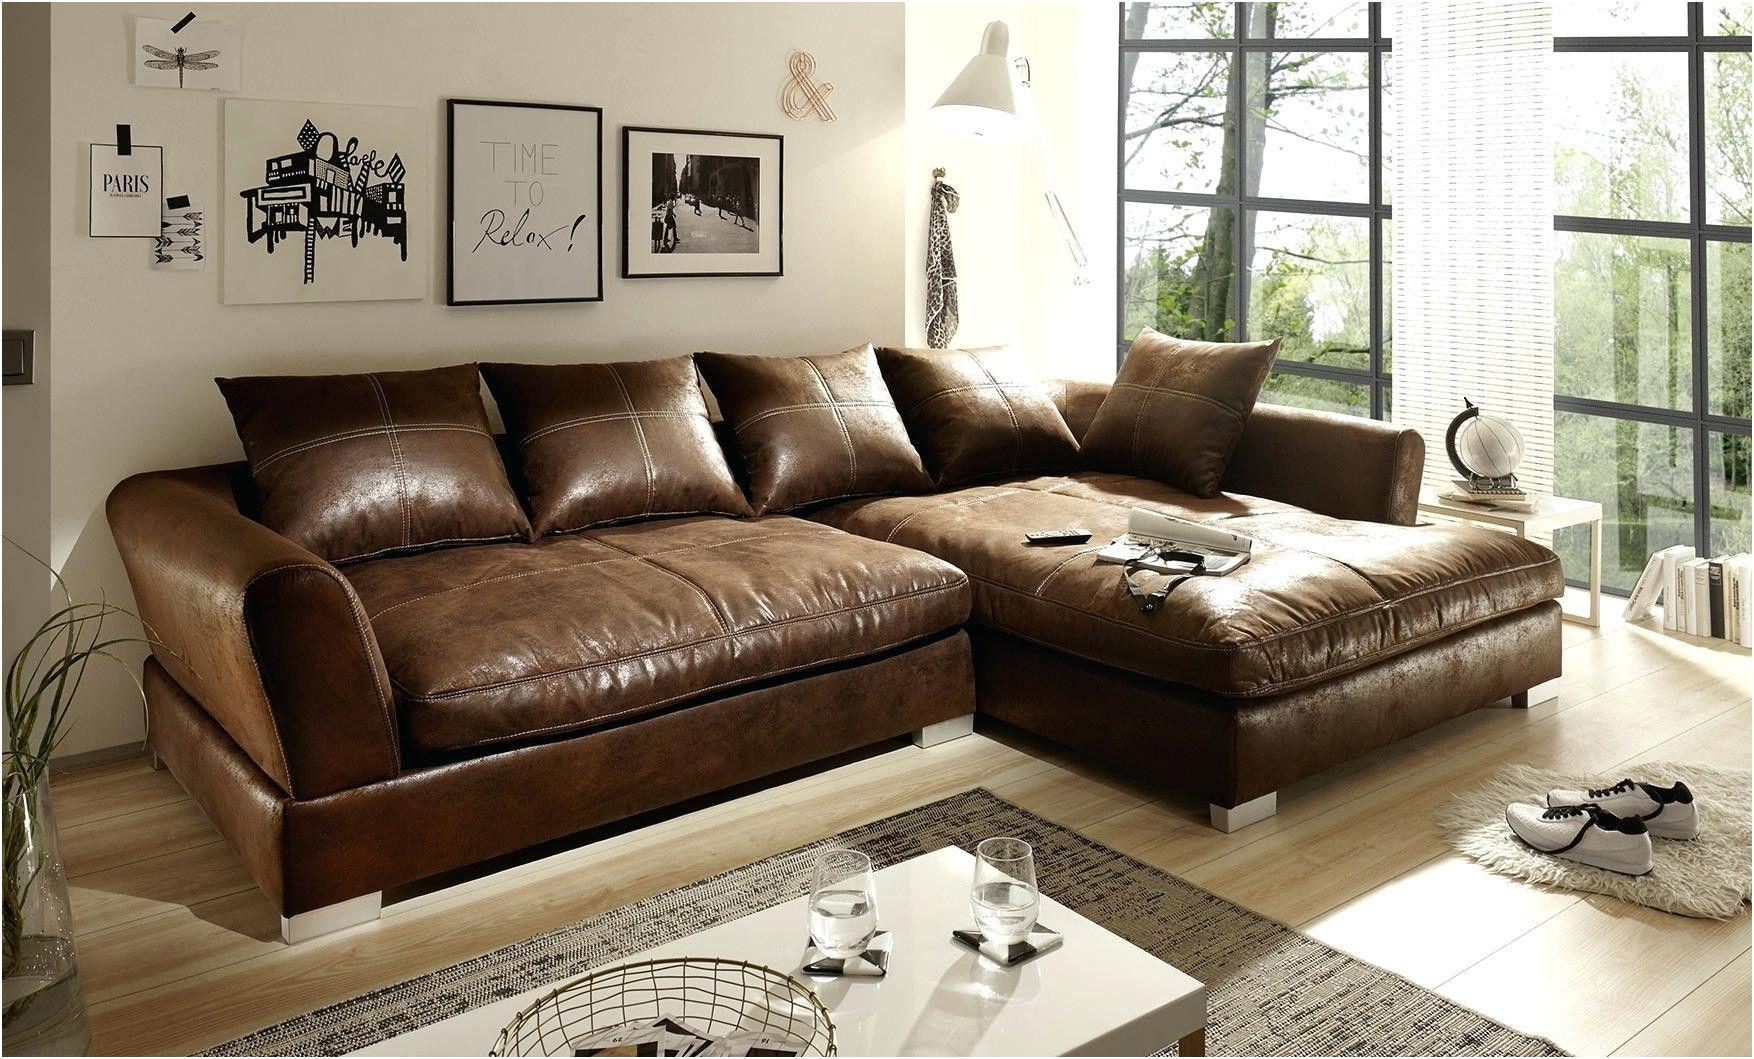 Kreativ Big Sofa Echtleder Grosse Sofas Ecksofas Couch Mobel